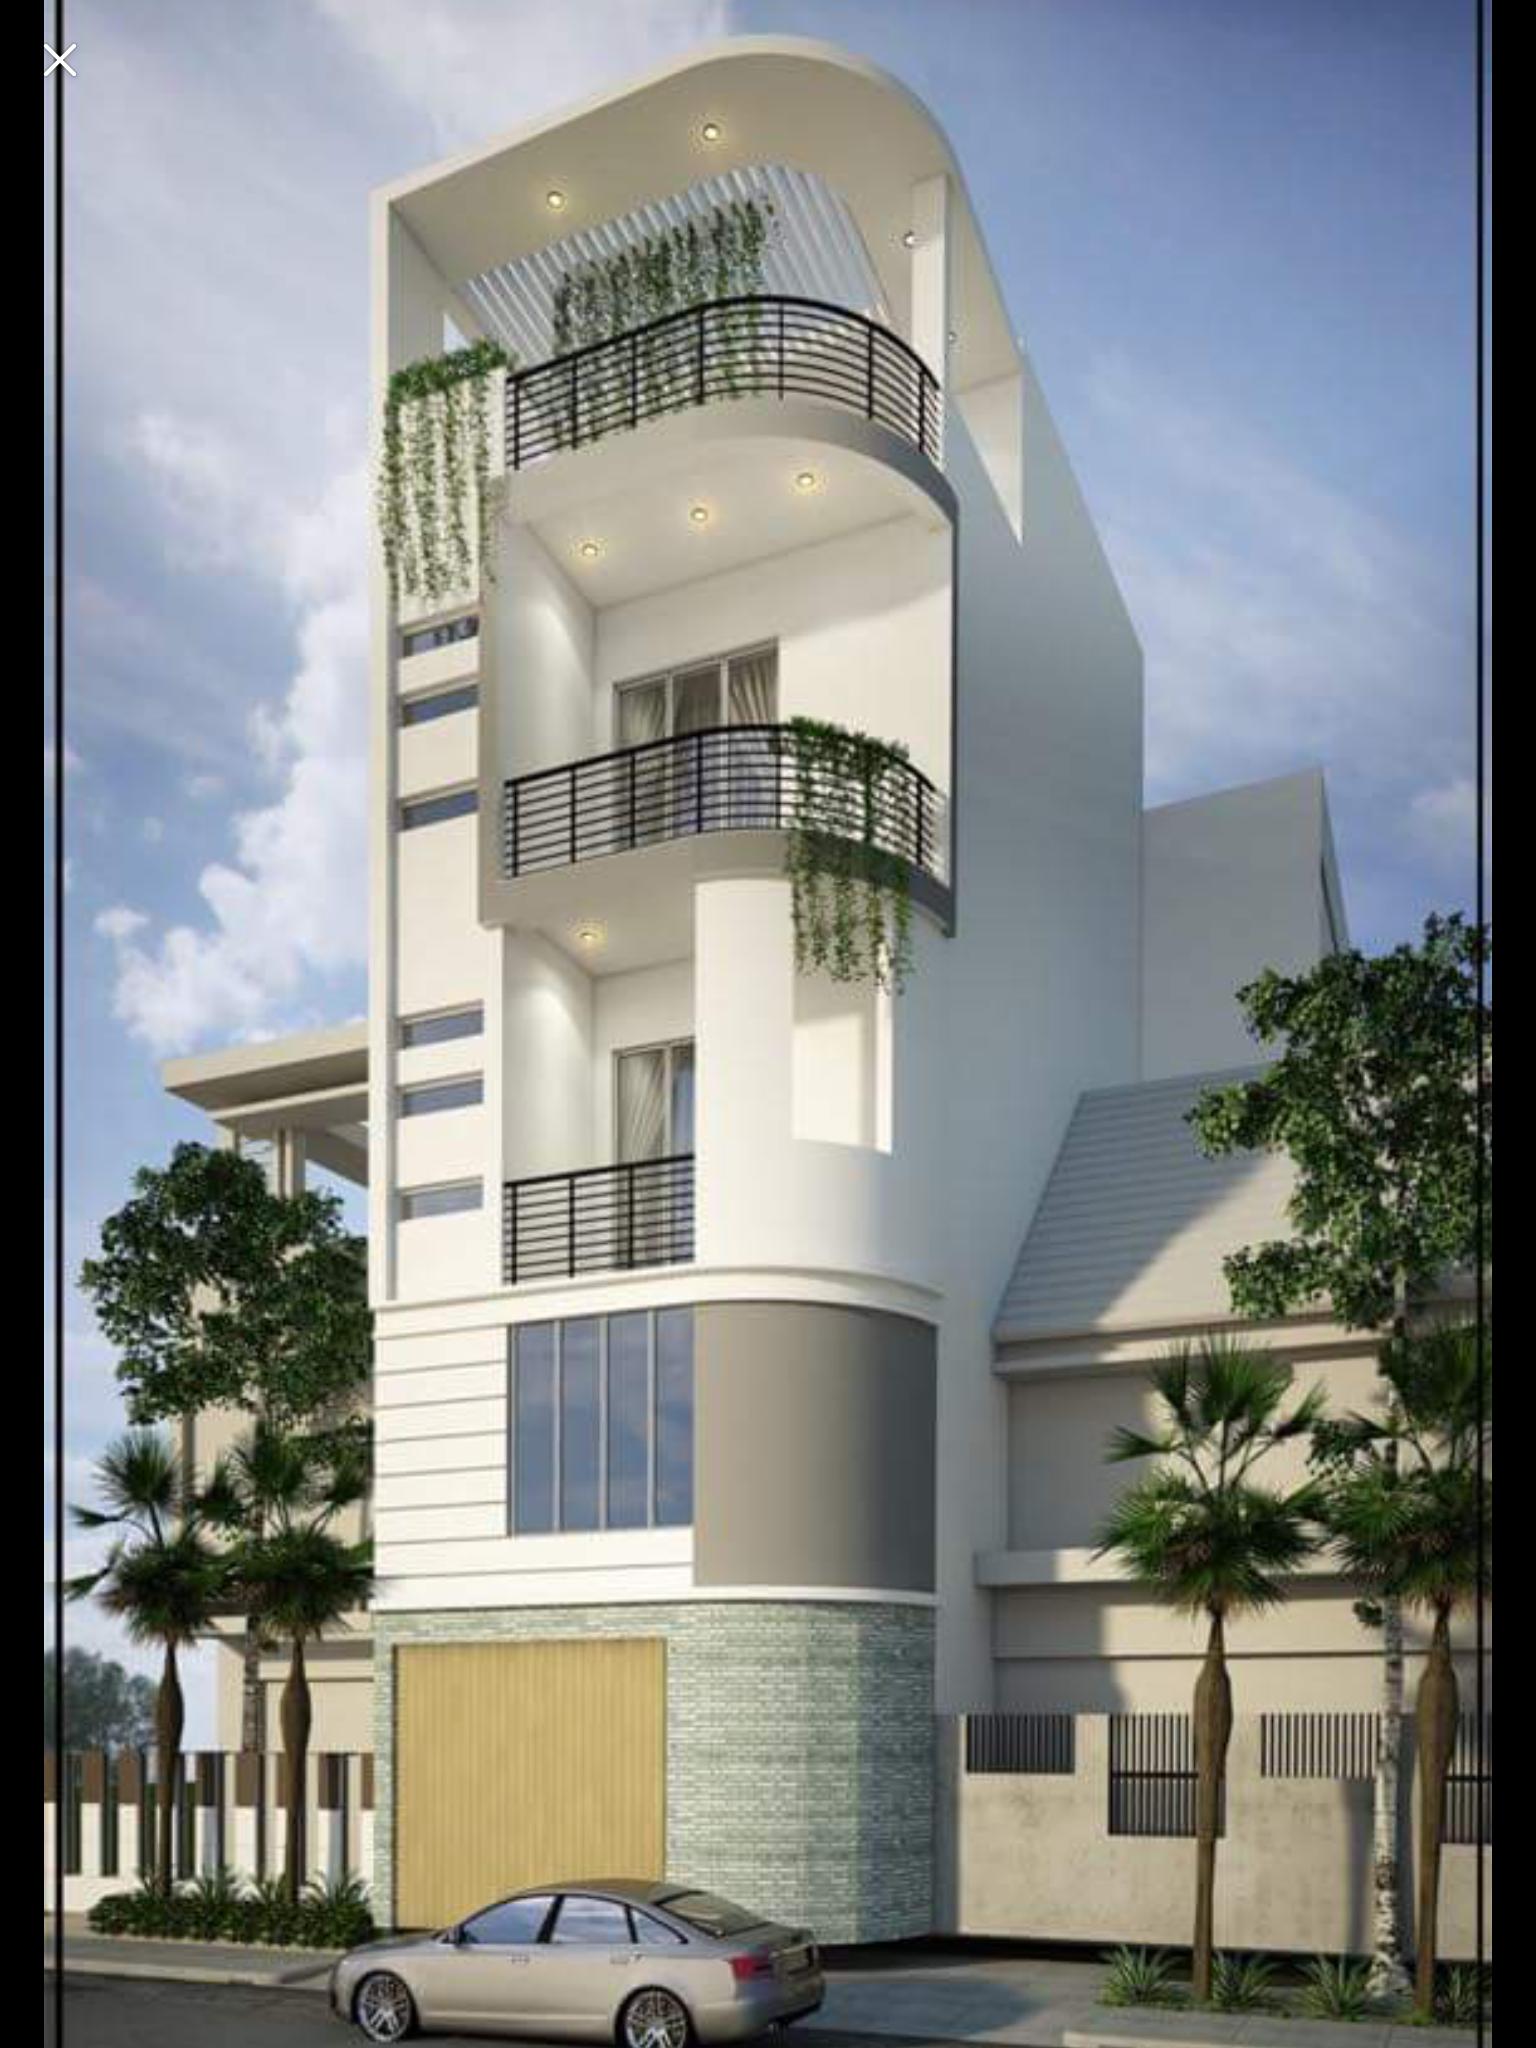 49 Most Popular Modern Dream House Exterior Design Ideas 3: Brick House Designs, Small House Exteriors, Small House Design Exterior